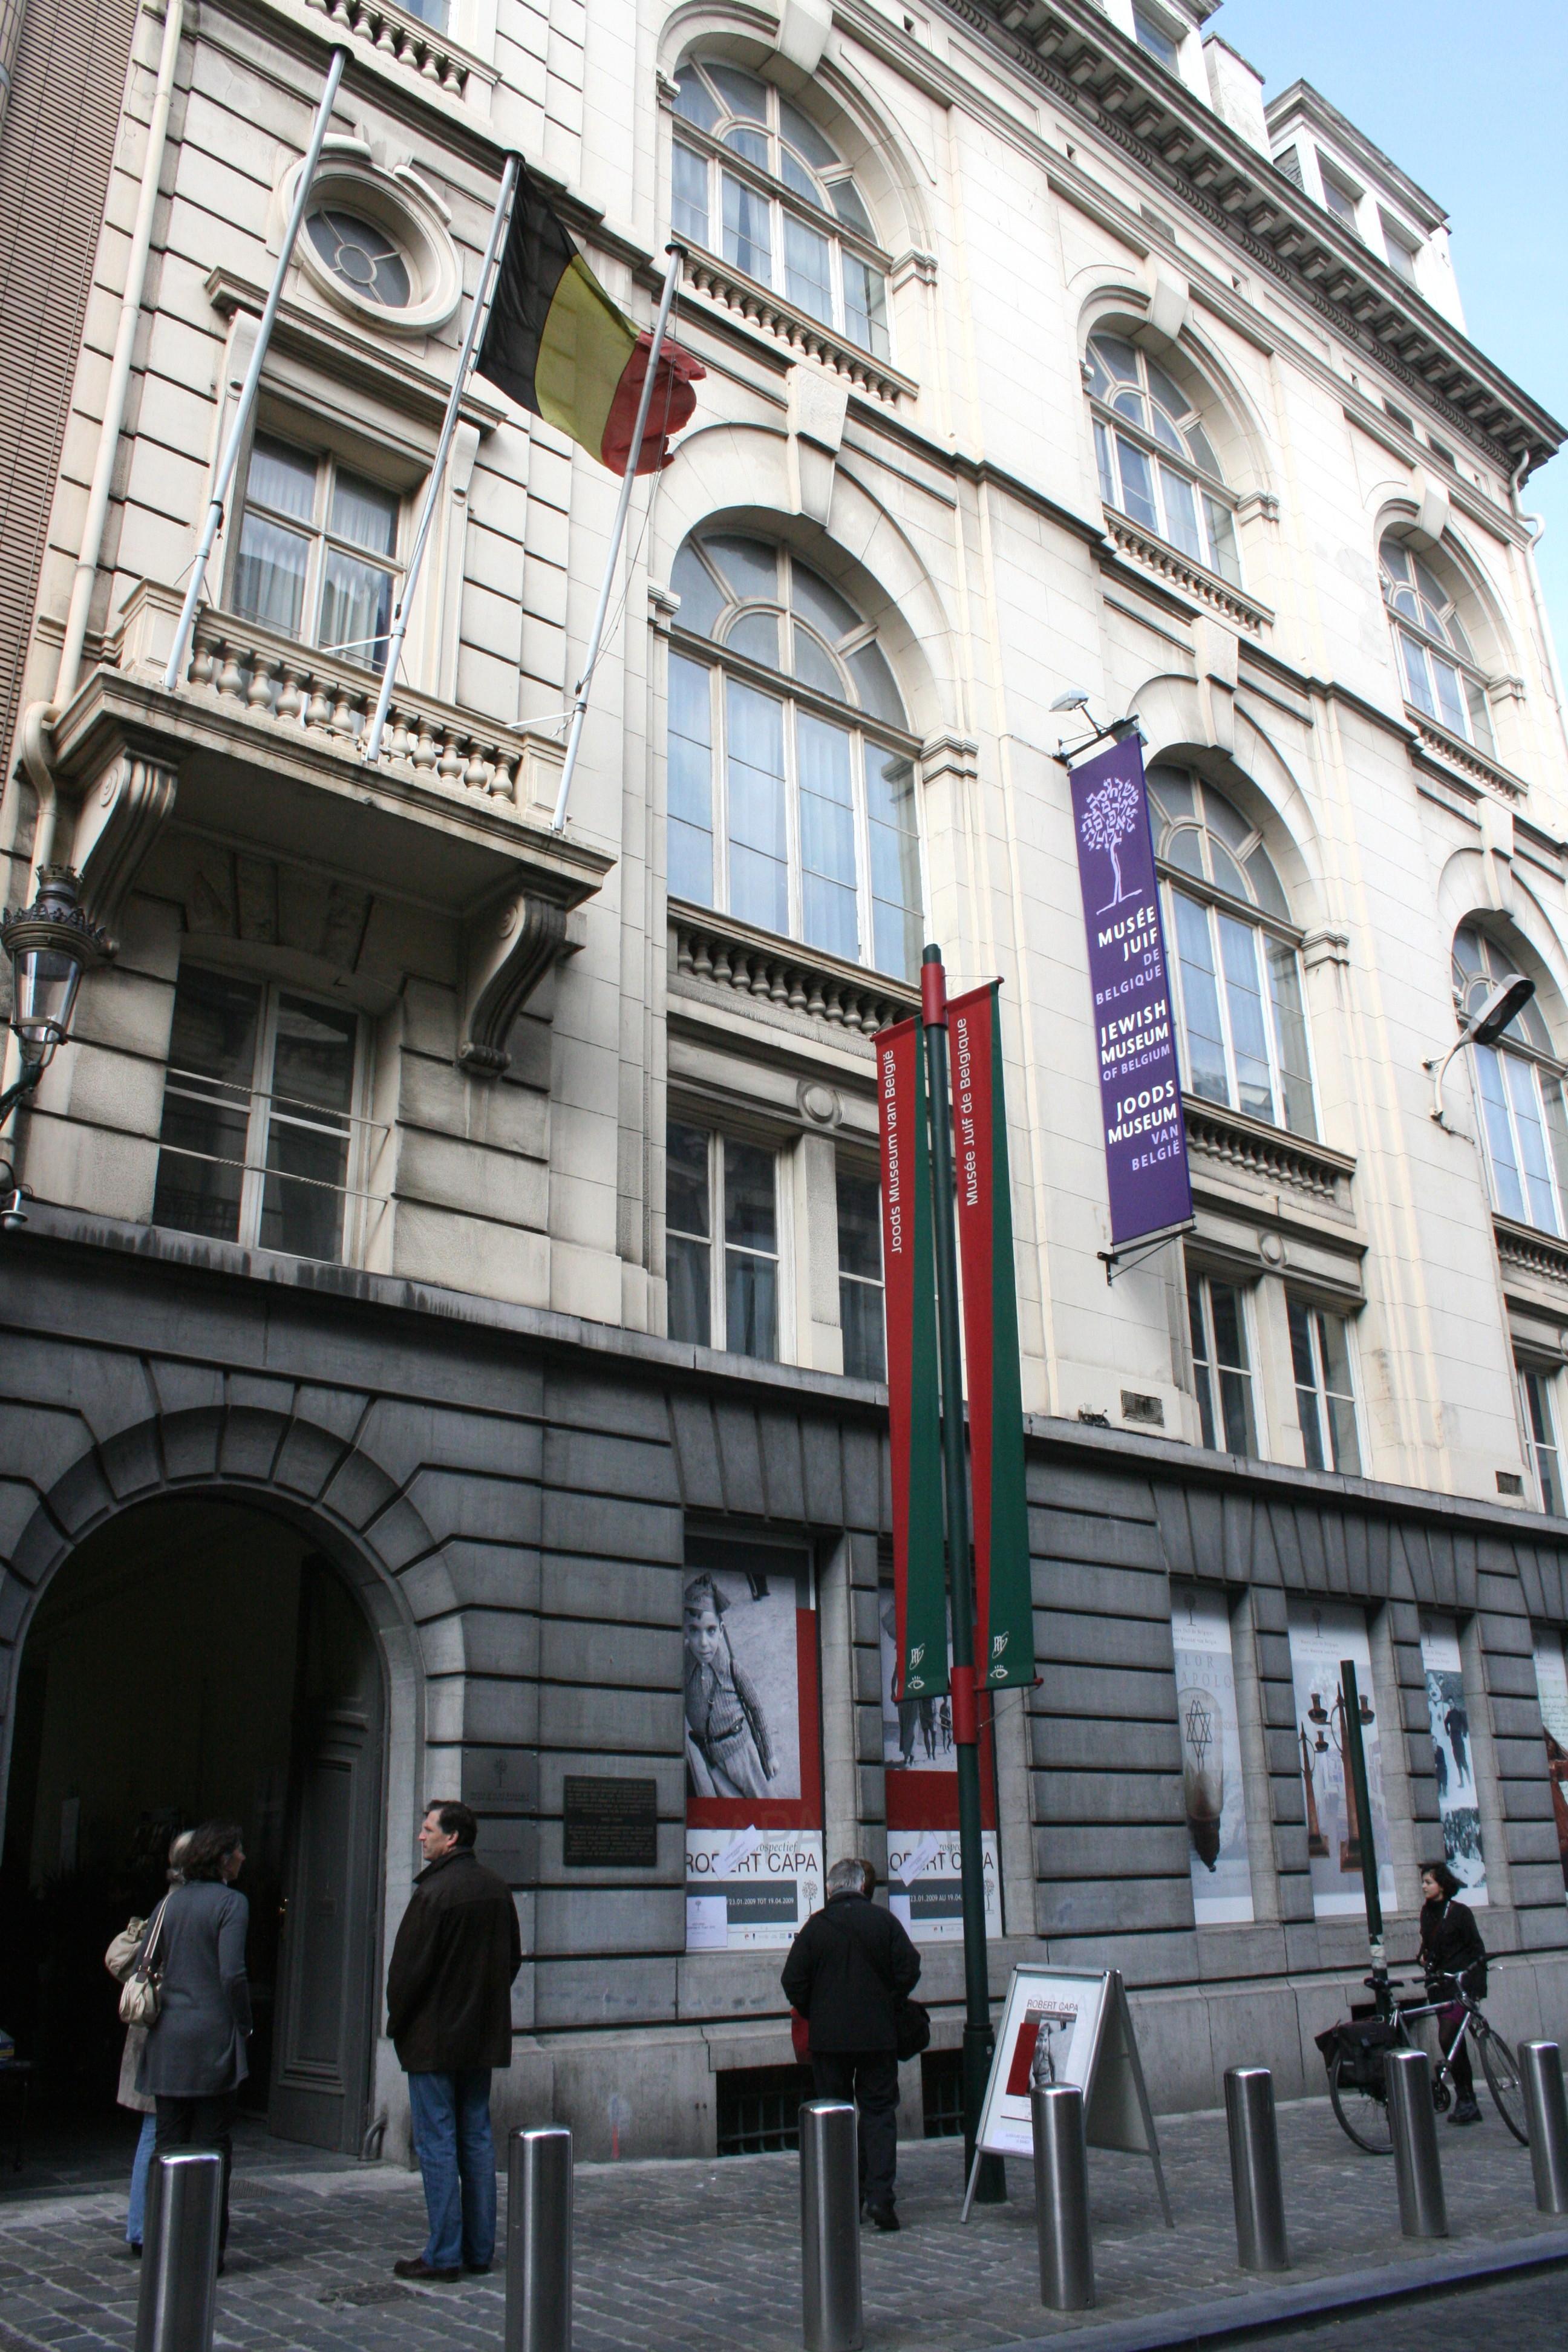 Bruxelles rue des Minimes 21.jpg